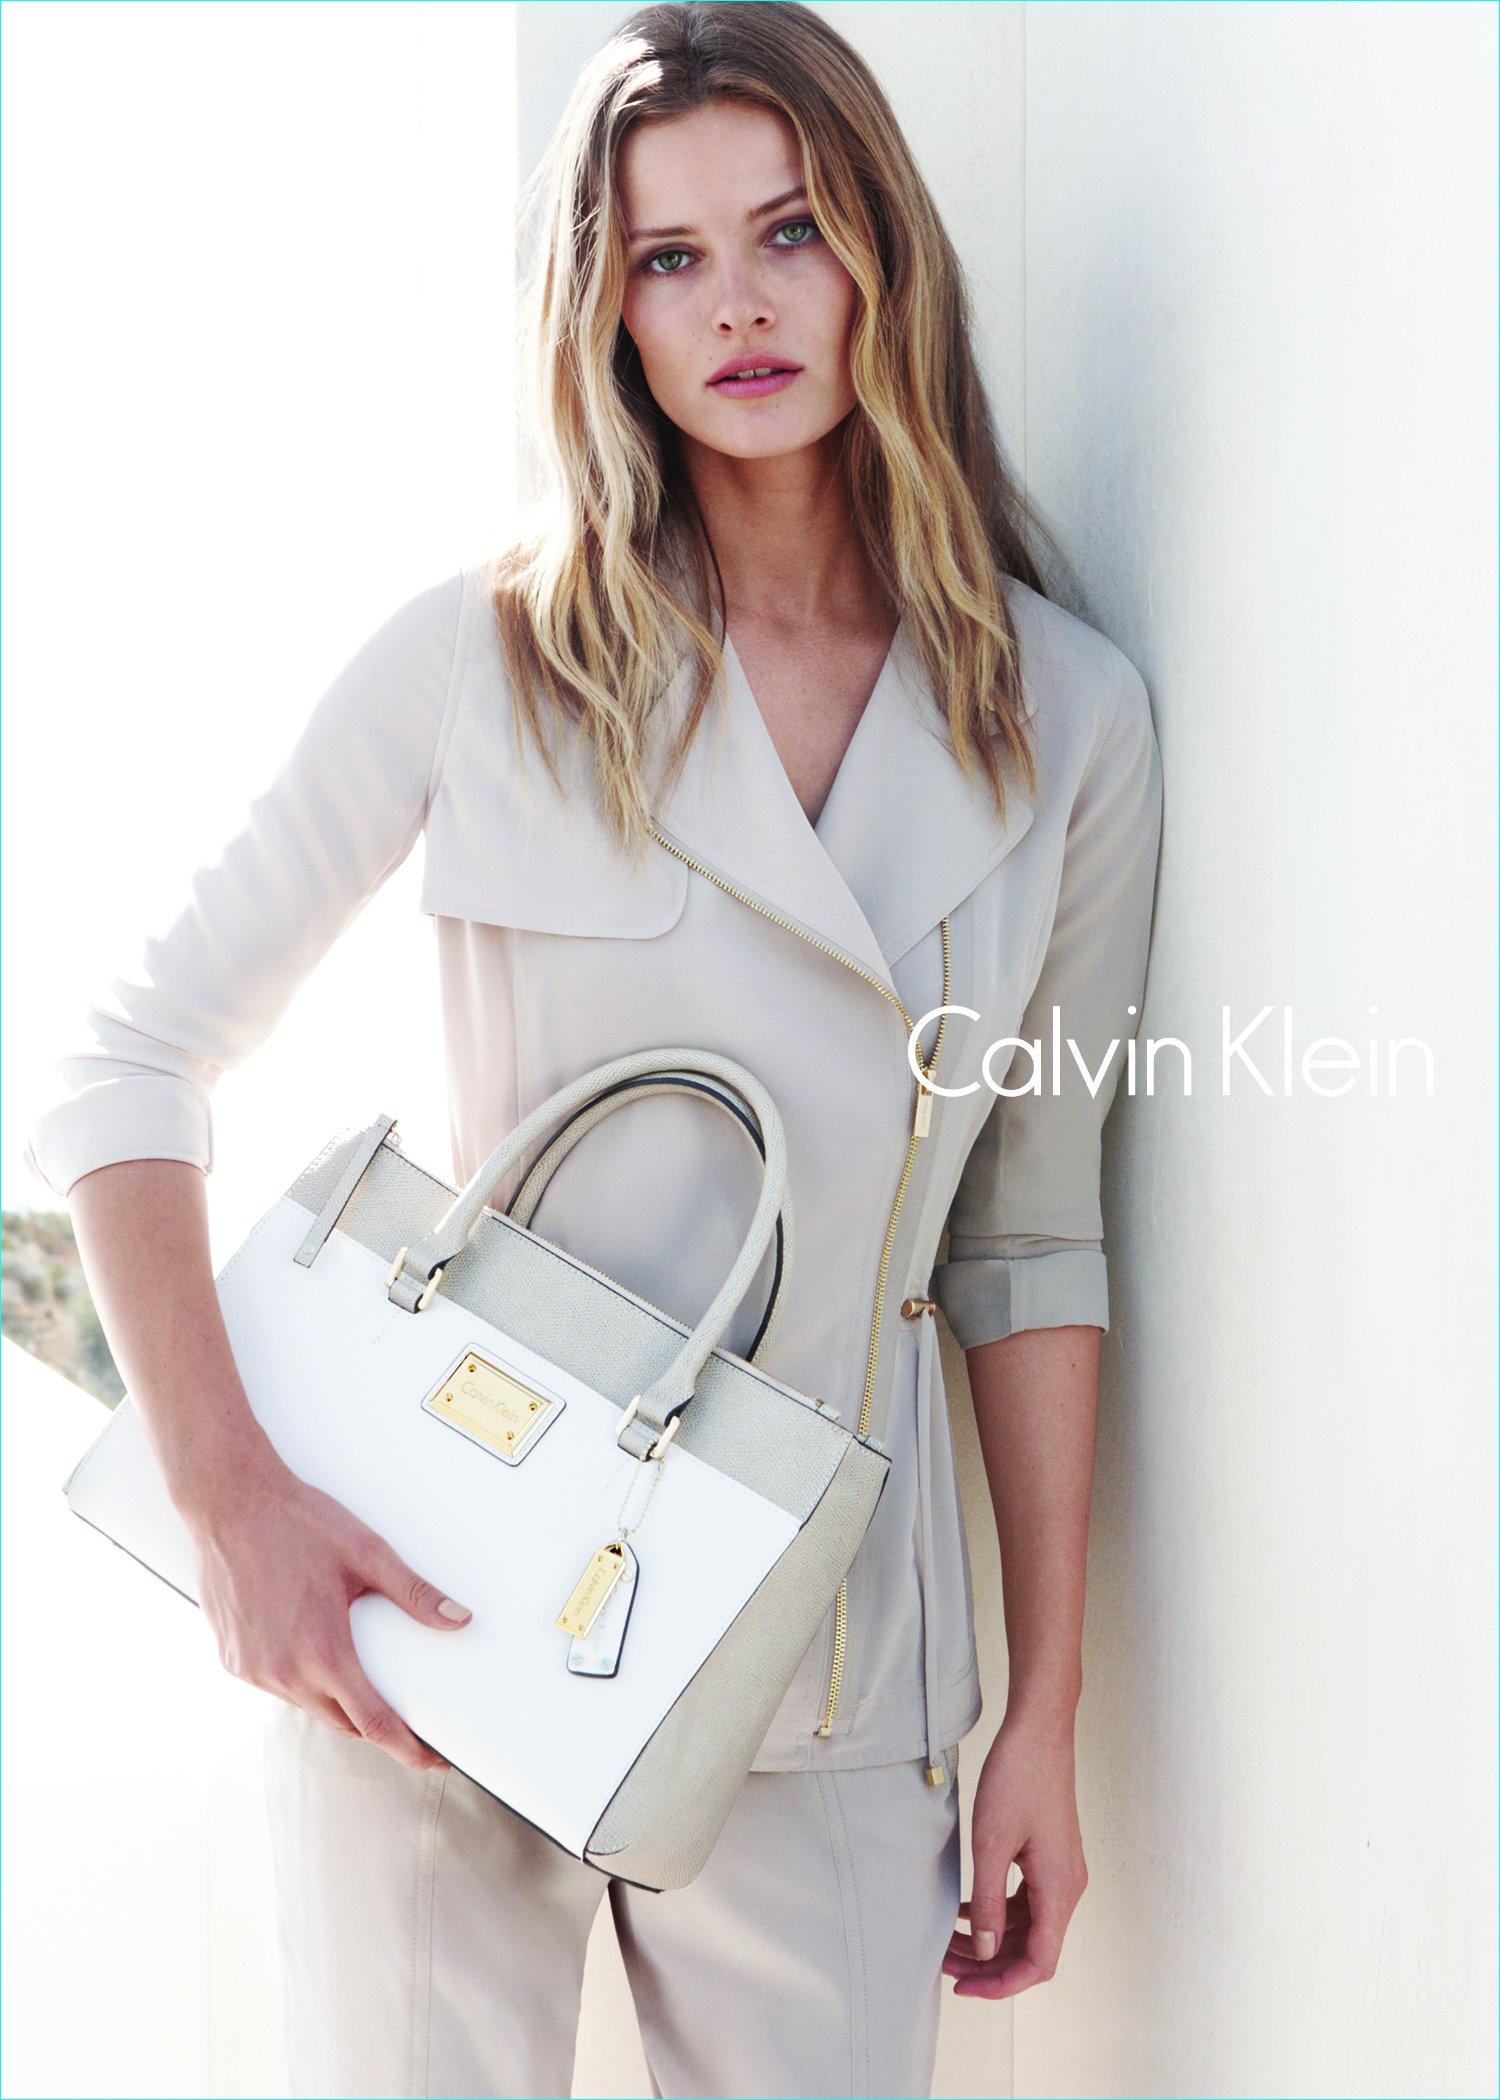 calvin-klein-white-label-s15-w_ph_dan-jackson_sg04